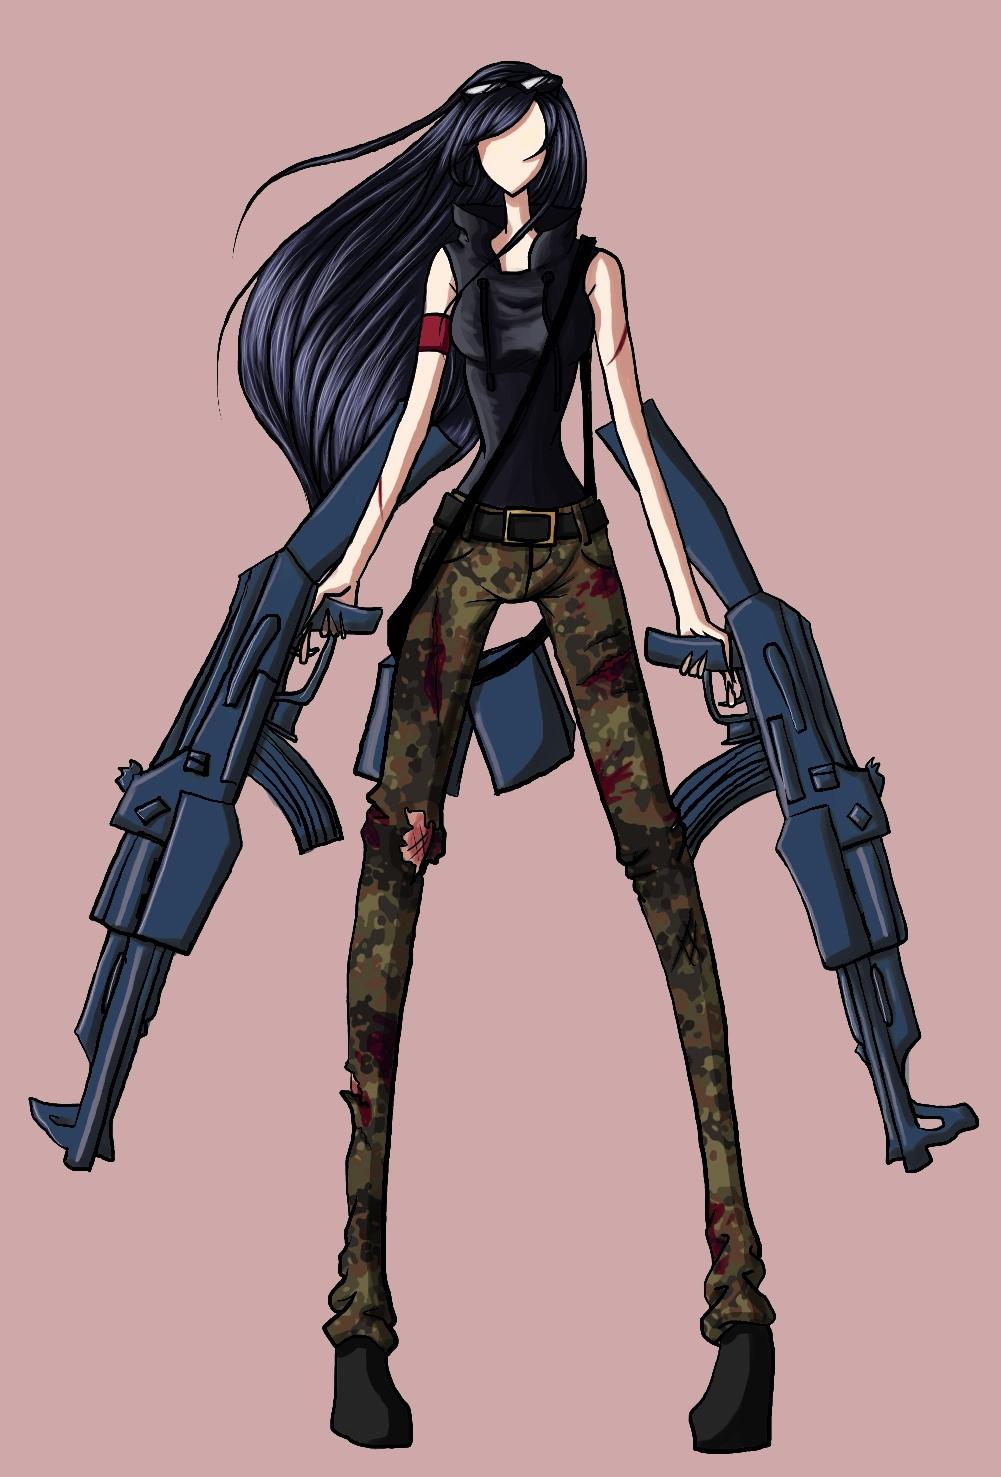 Let S Go Kill Some Zombies Machine Guns Girl Jpg 1001x1477 Deviantart Girls  Killing Zombies Drawings